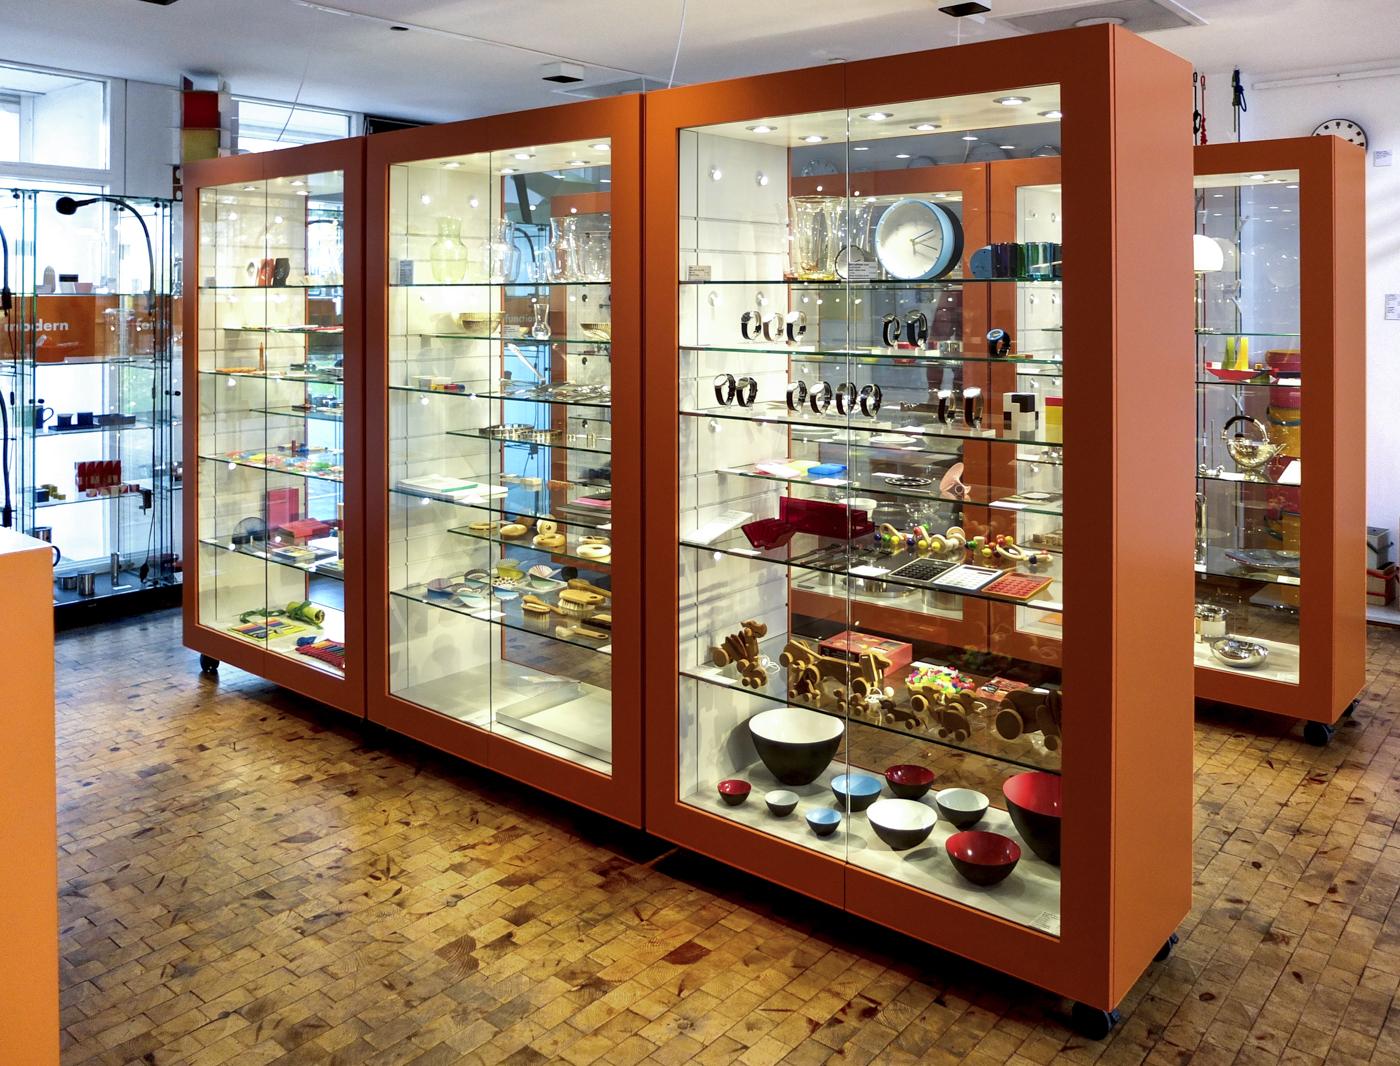 Shop Vitrinen Bauhaus Shop Im Bauhaus Archiv Berlin Jan Martin